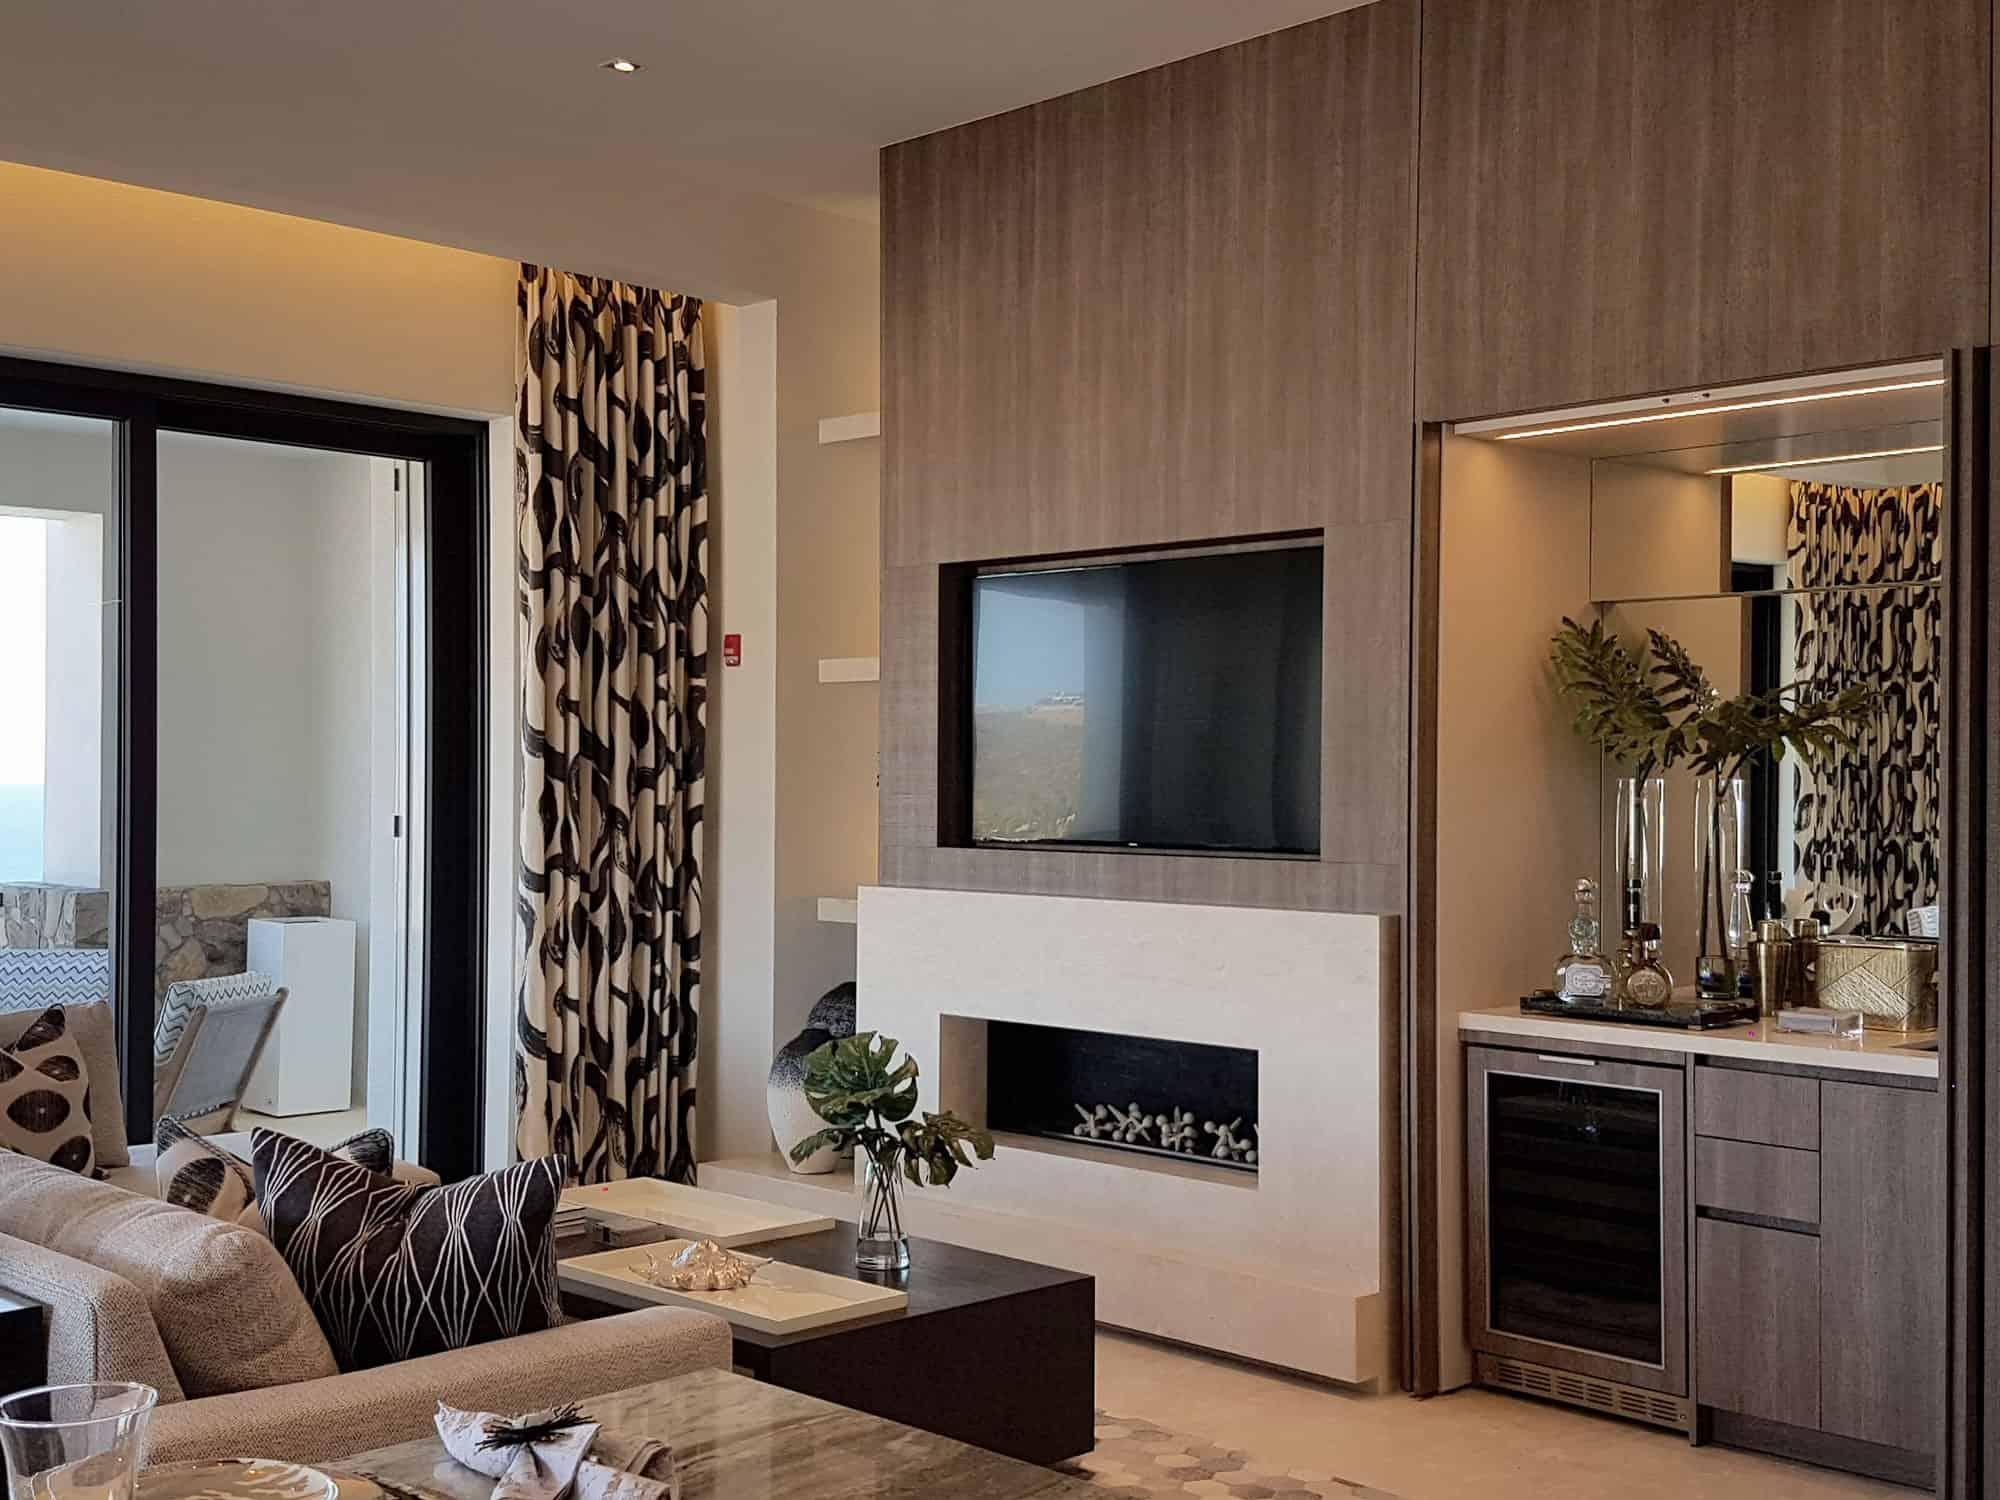 cozy modern design hides a lot of clutter thanks to eggersmann designers